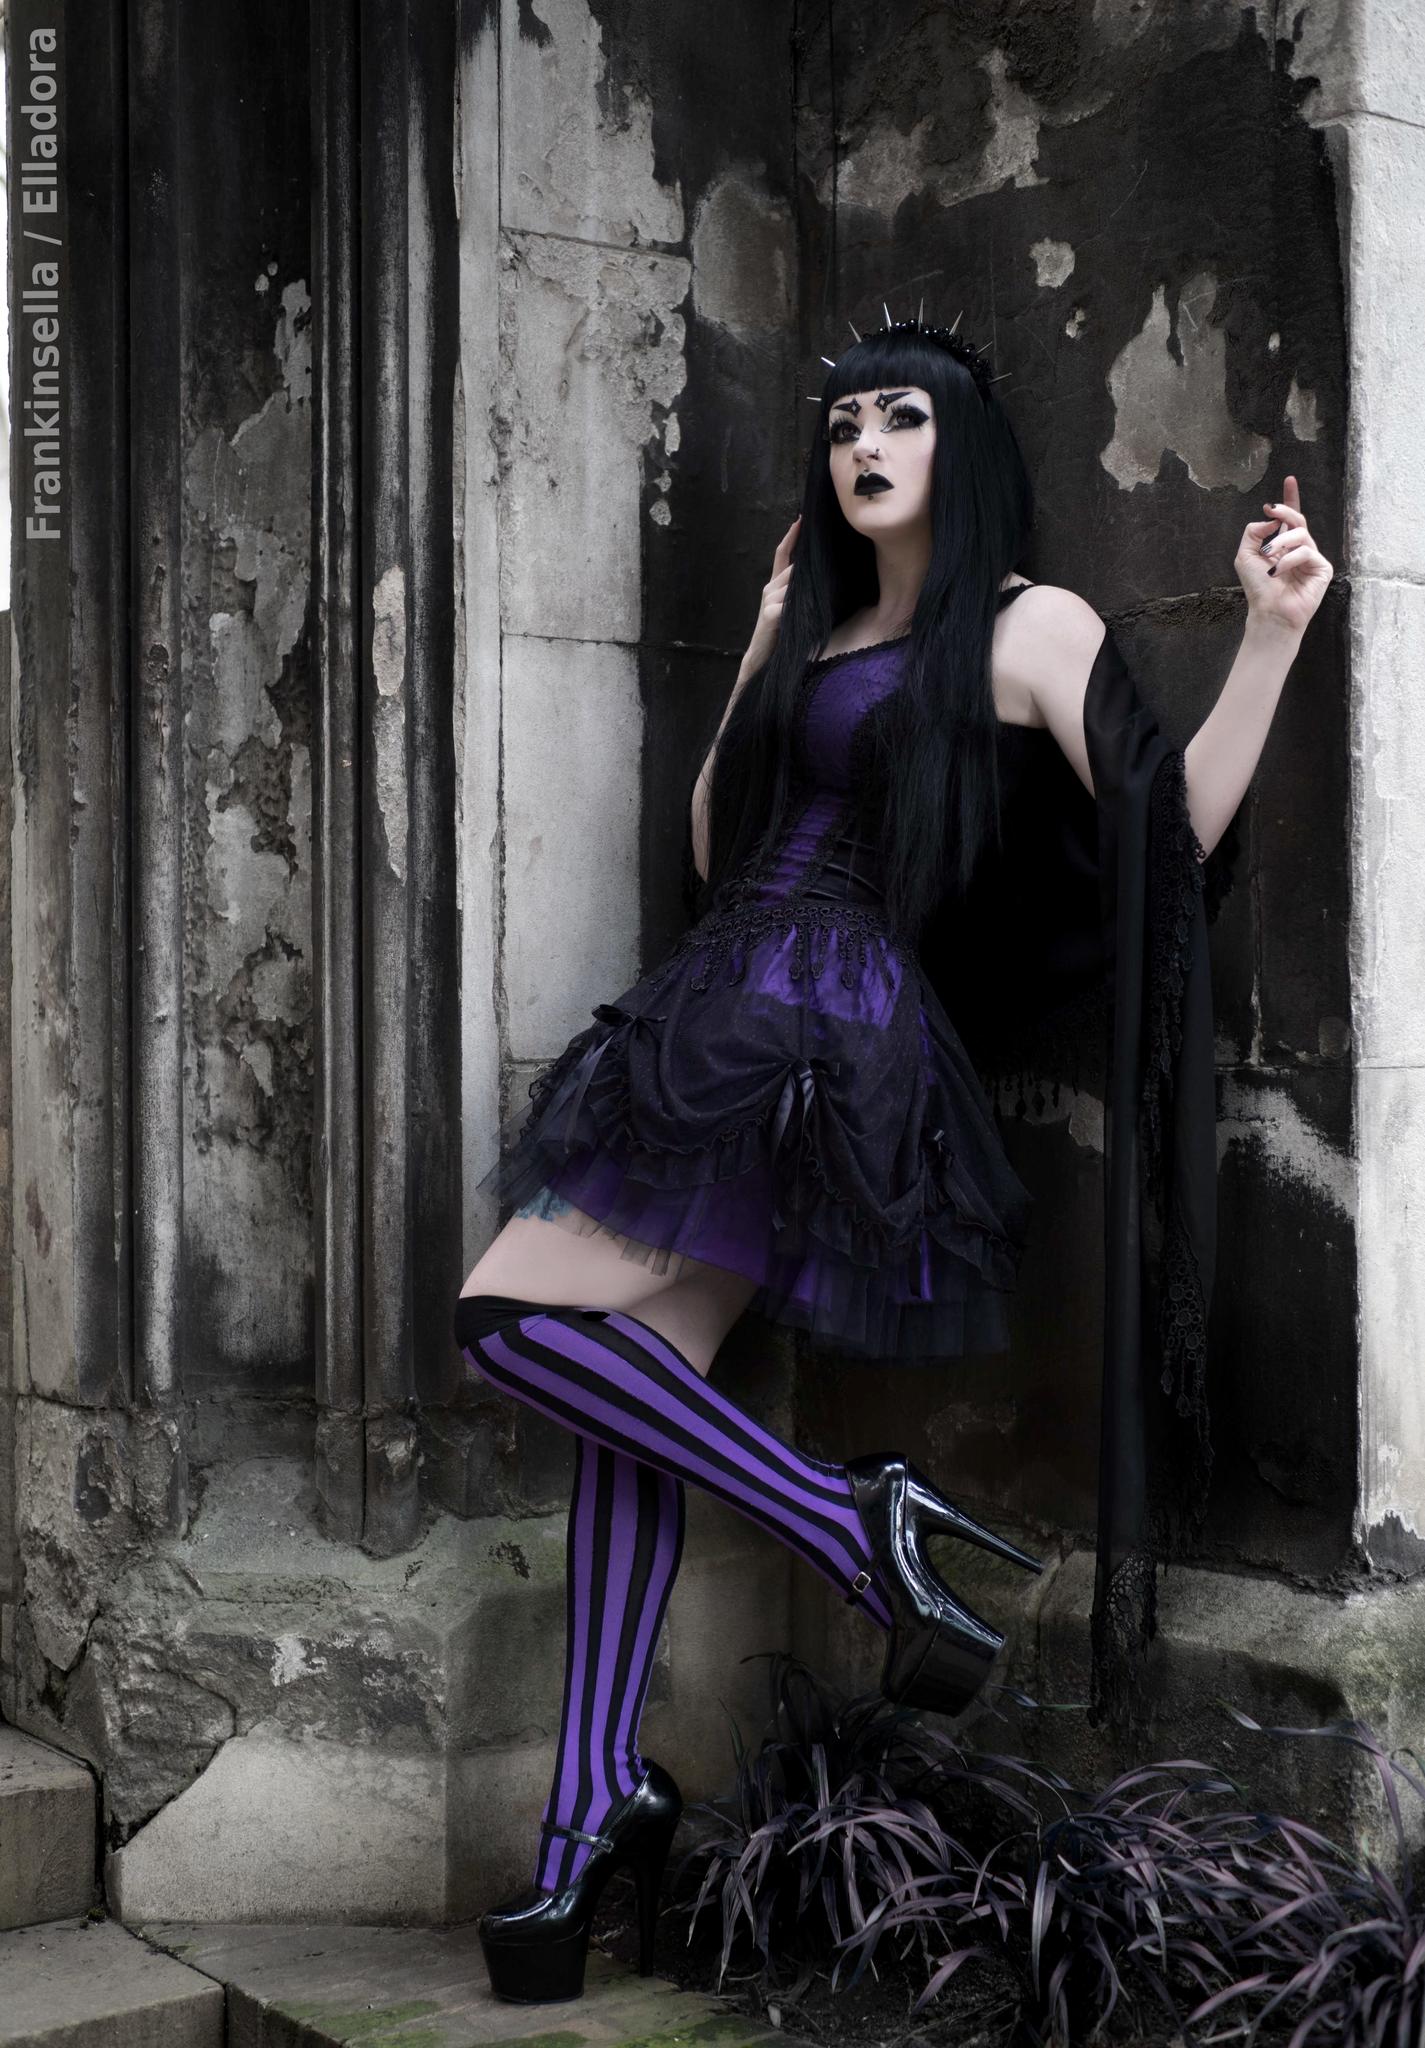 Model Elladora Photography Frankinsella #Fashion #Style #Gothic #Gothgoth #Headpiece #Velvet